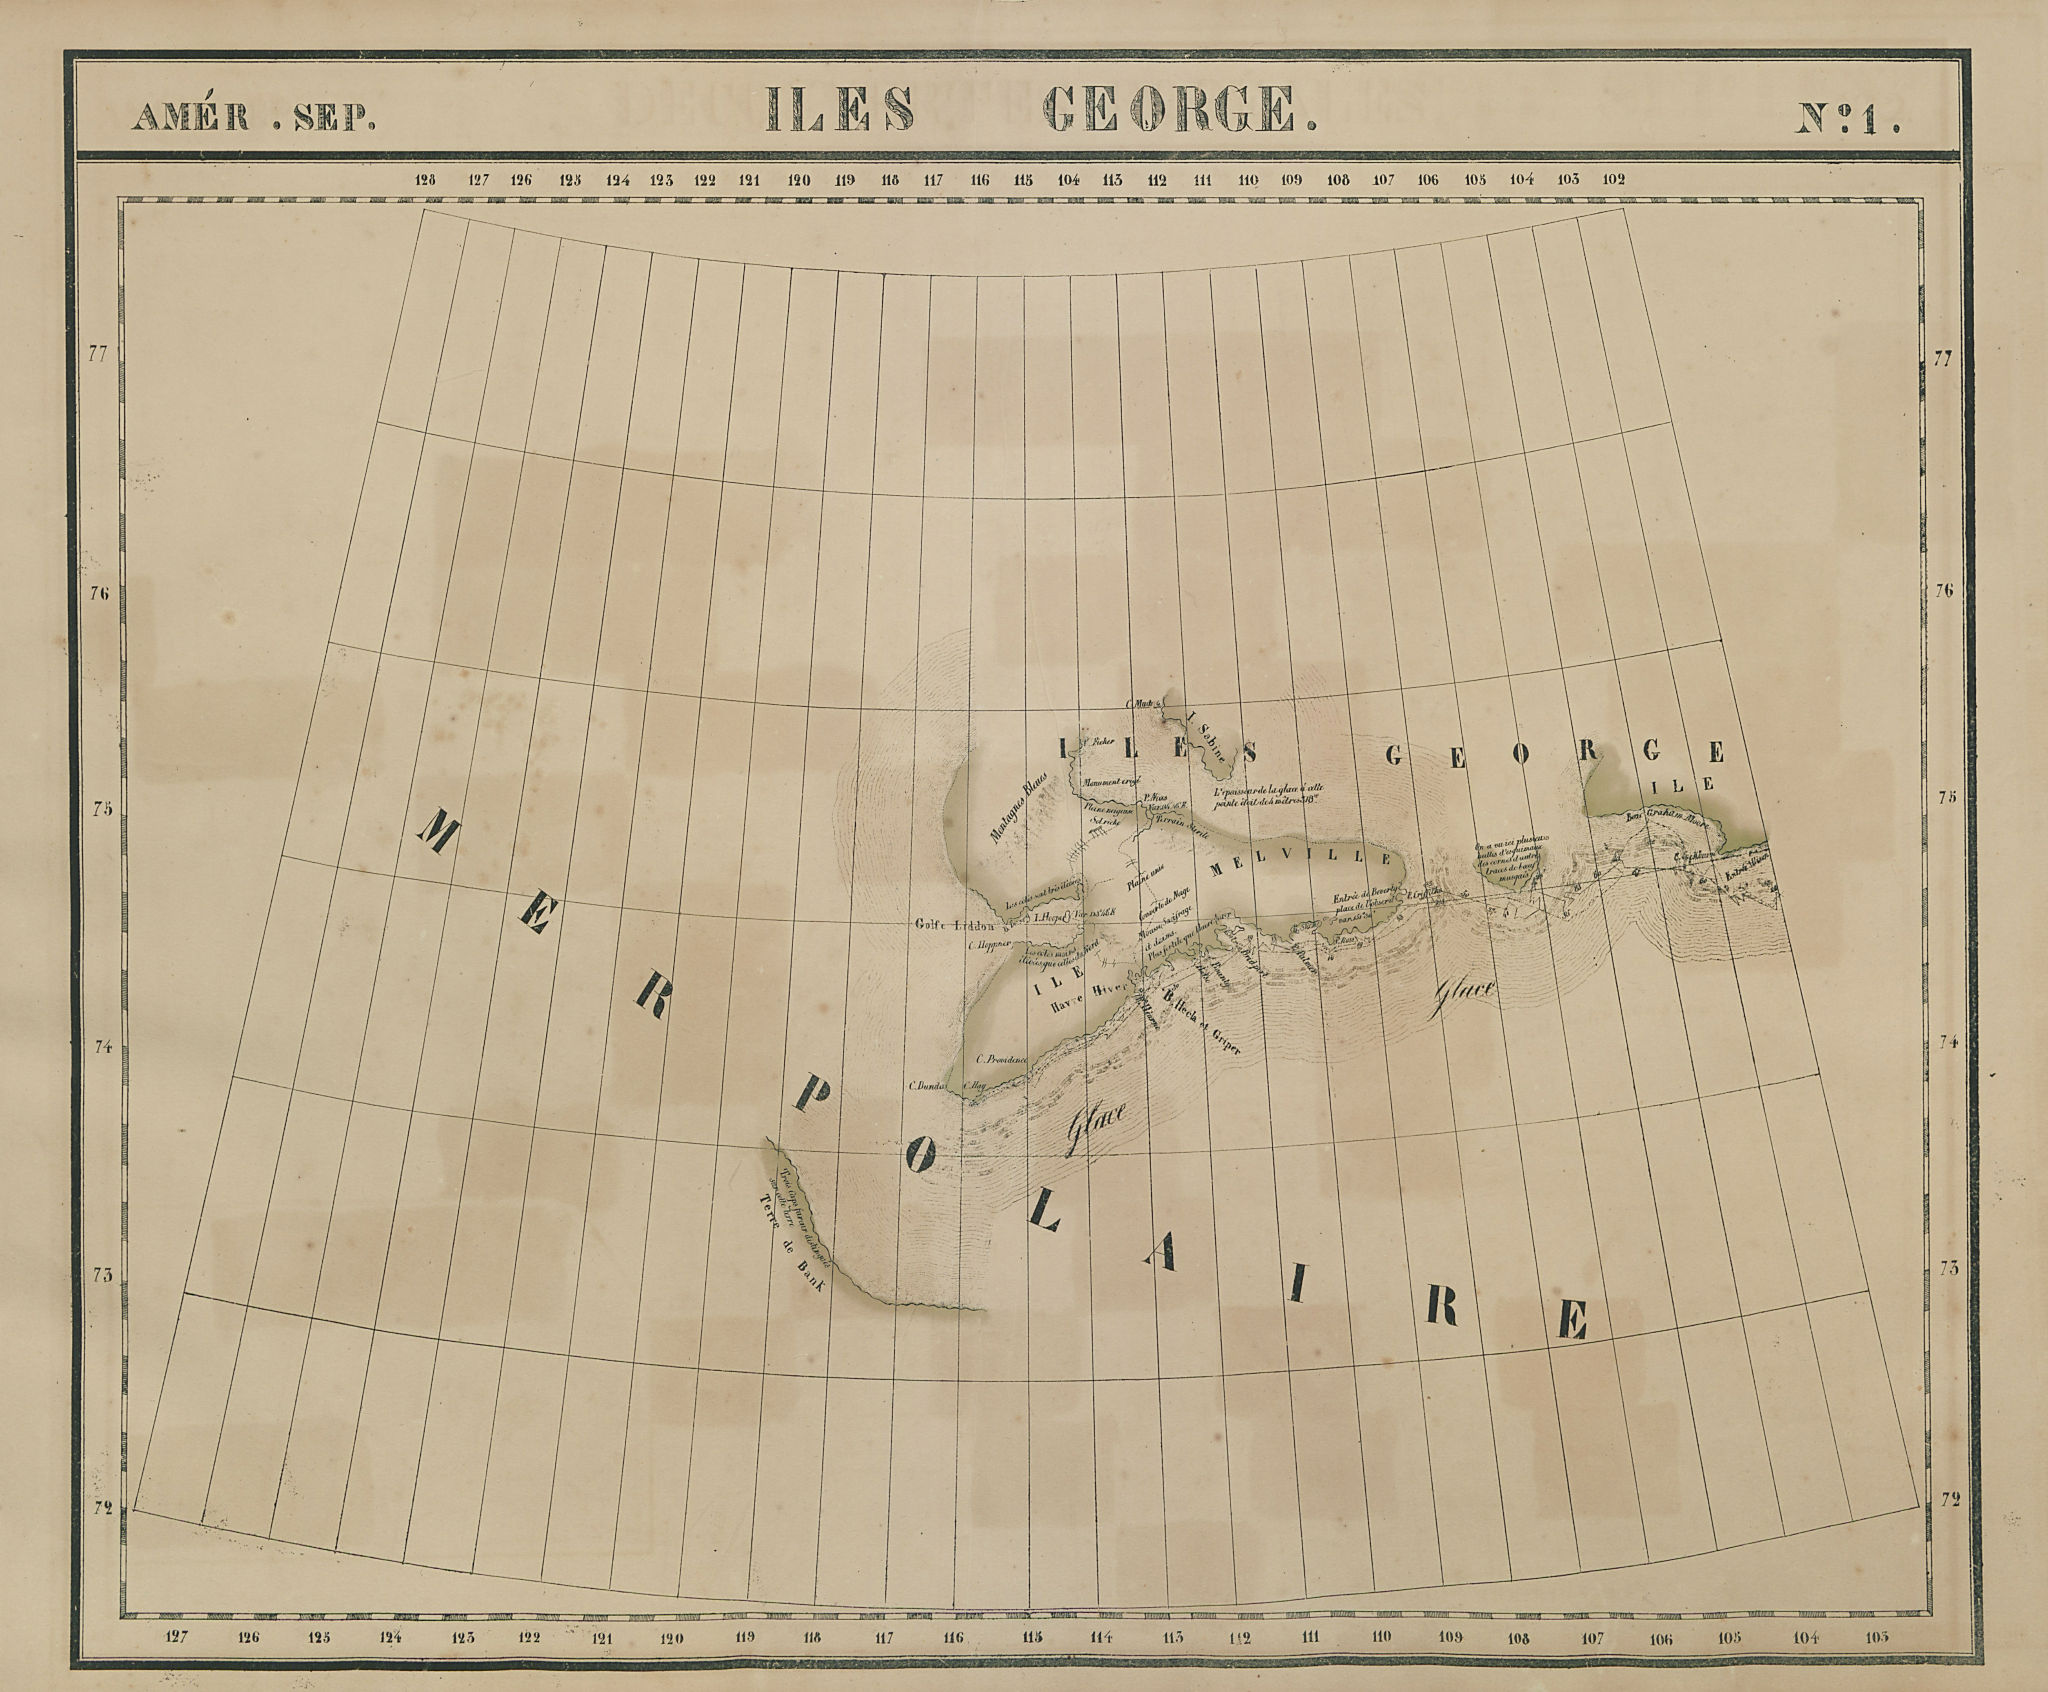 Amér. Sep. Iles George #1. Melville Island Canadian Arctic VANDERMAELEN 1827 map